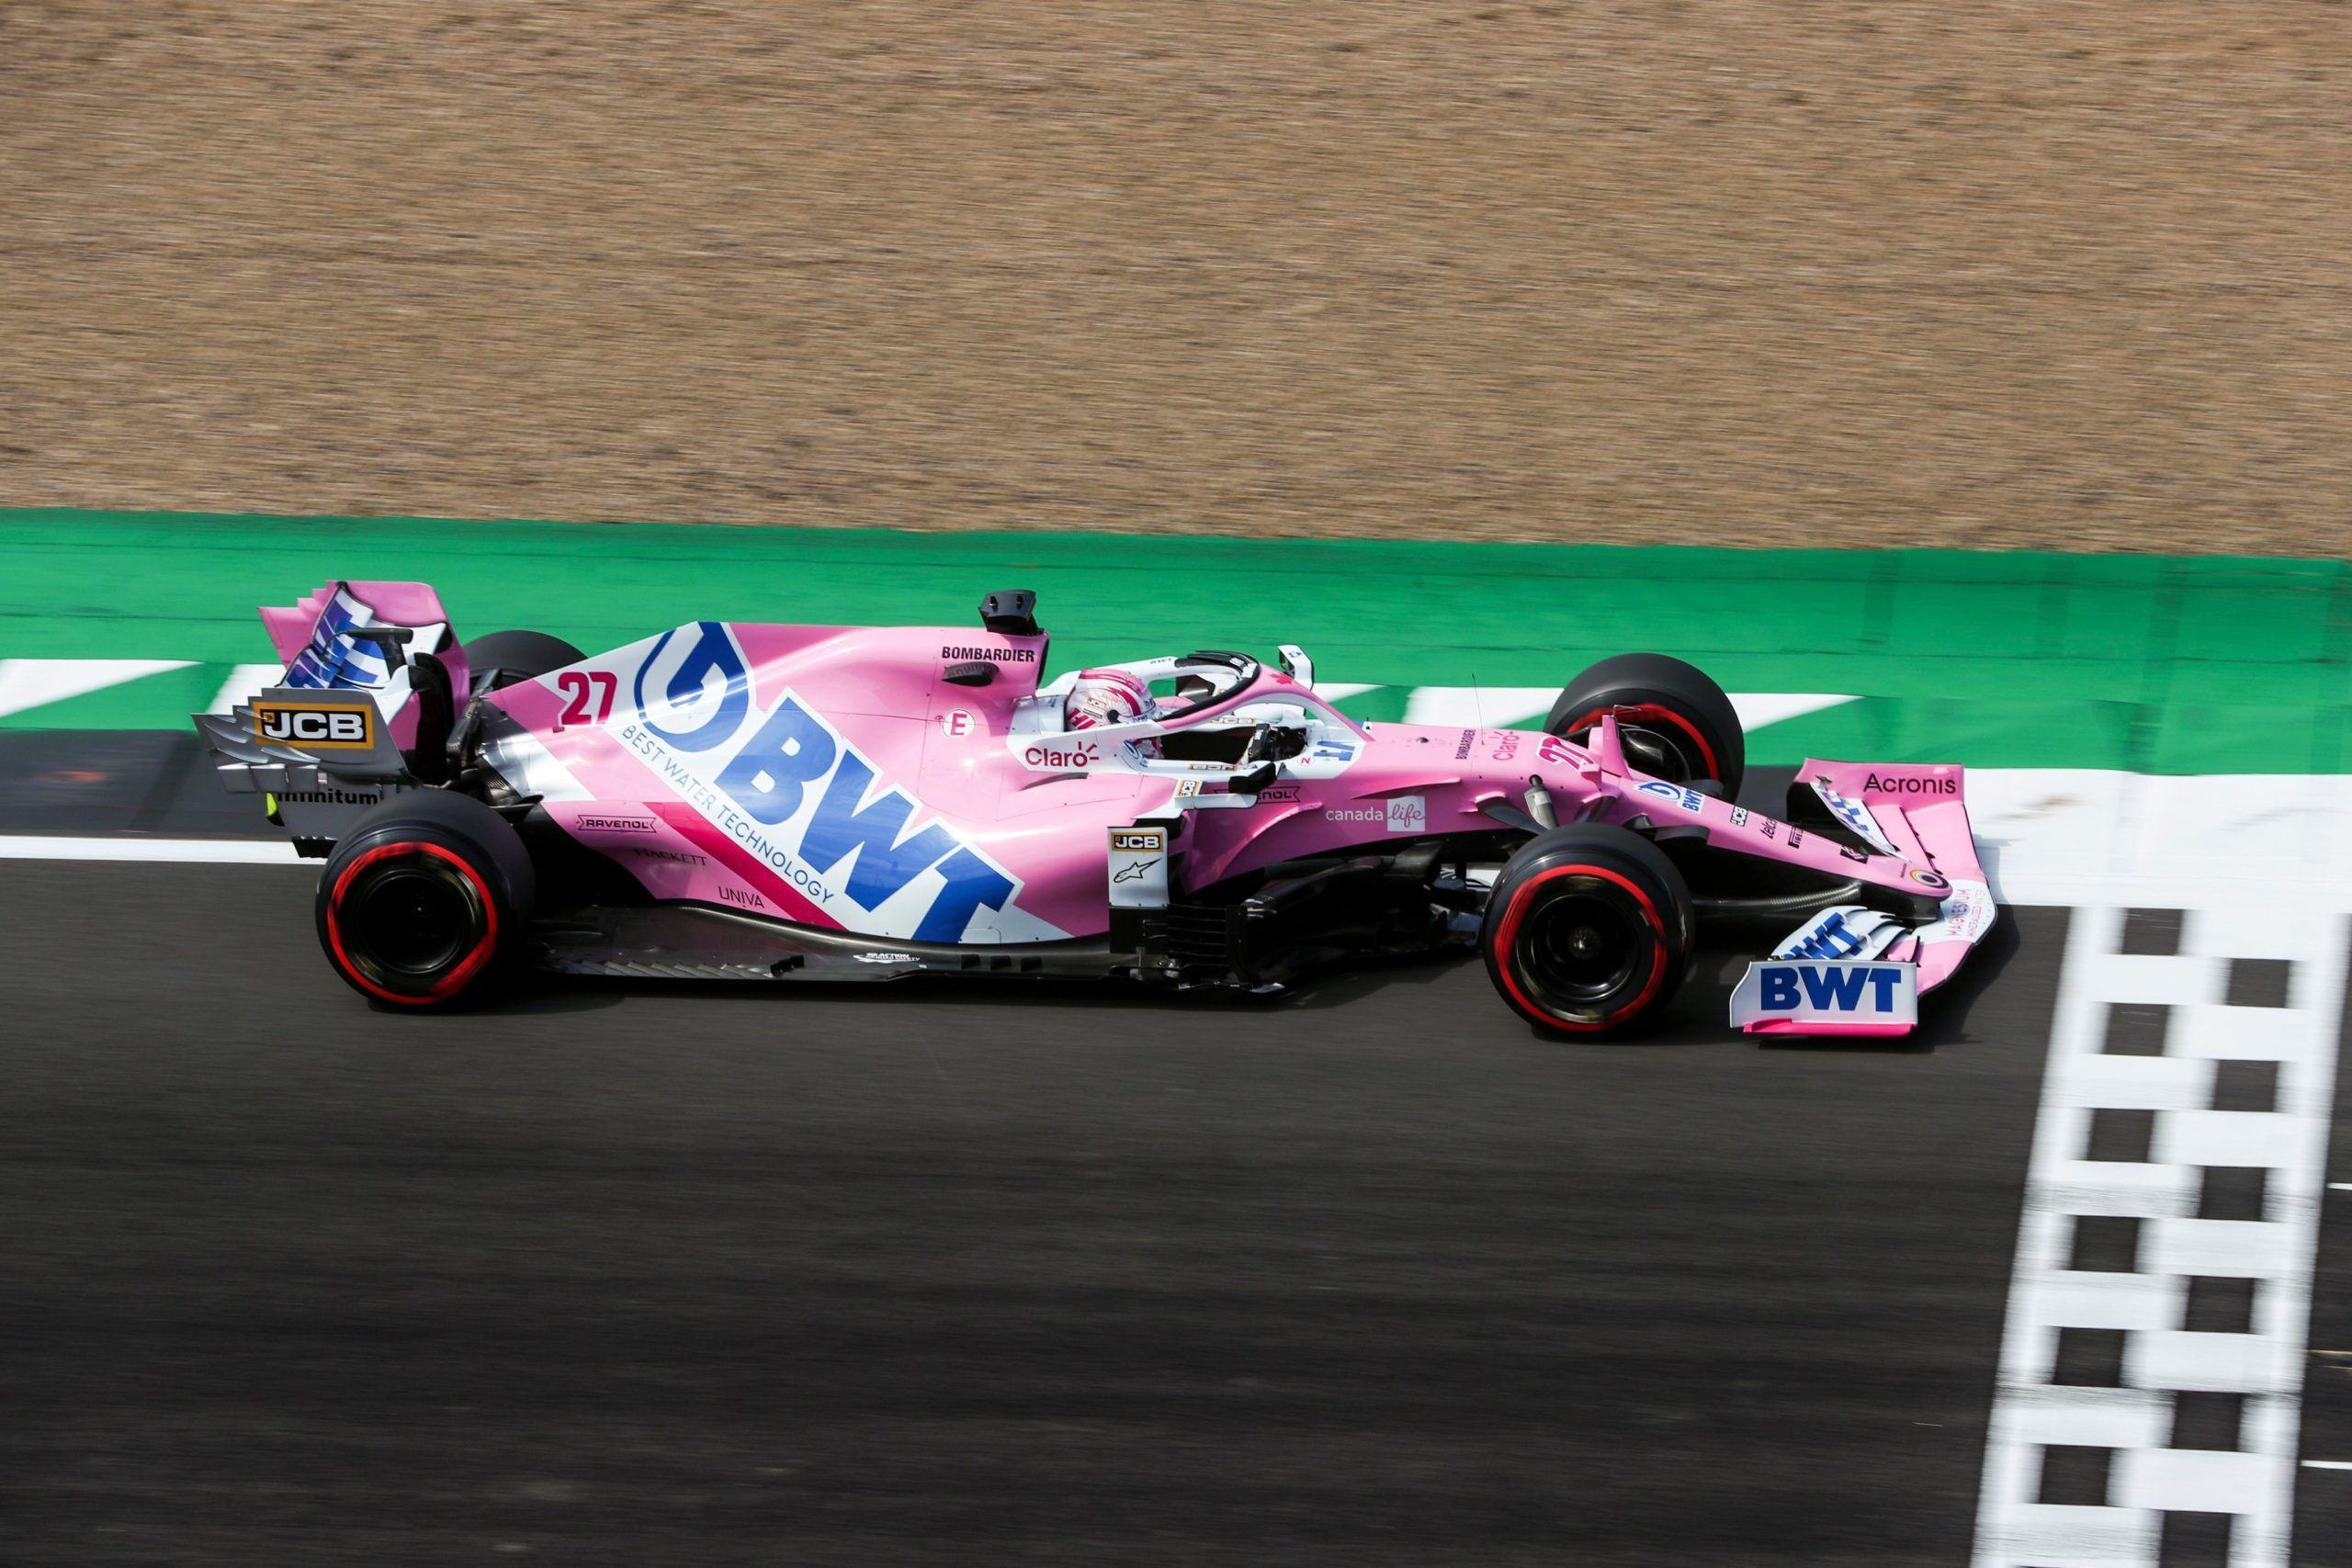 F1, 70th Anniversary GP